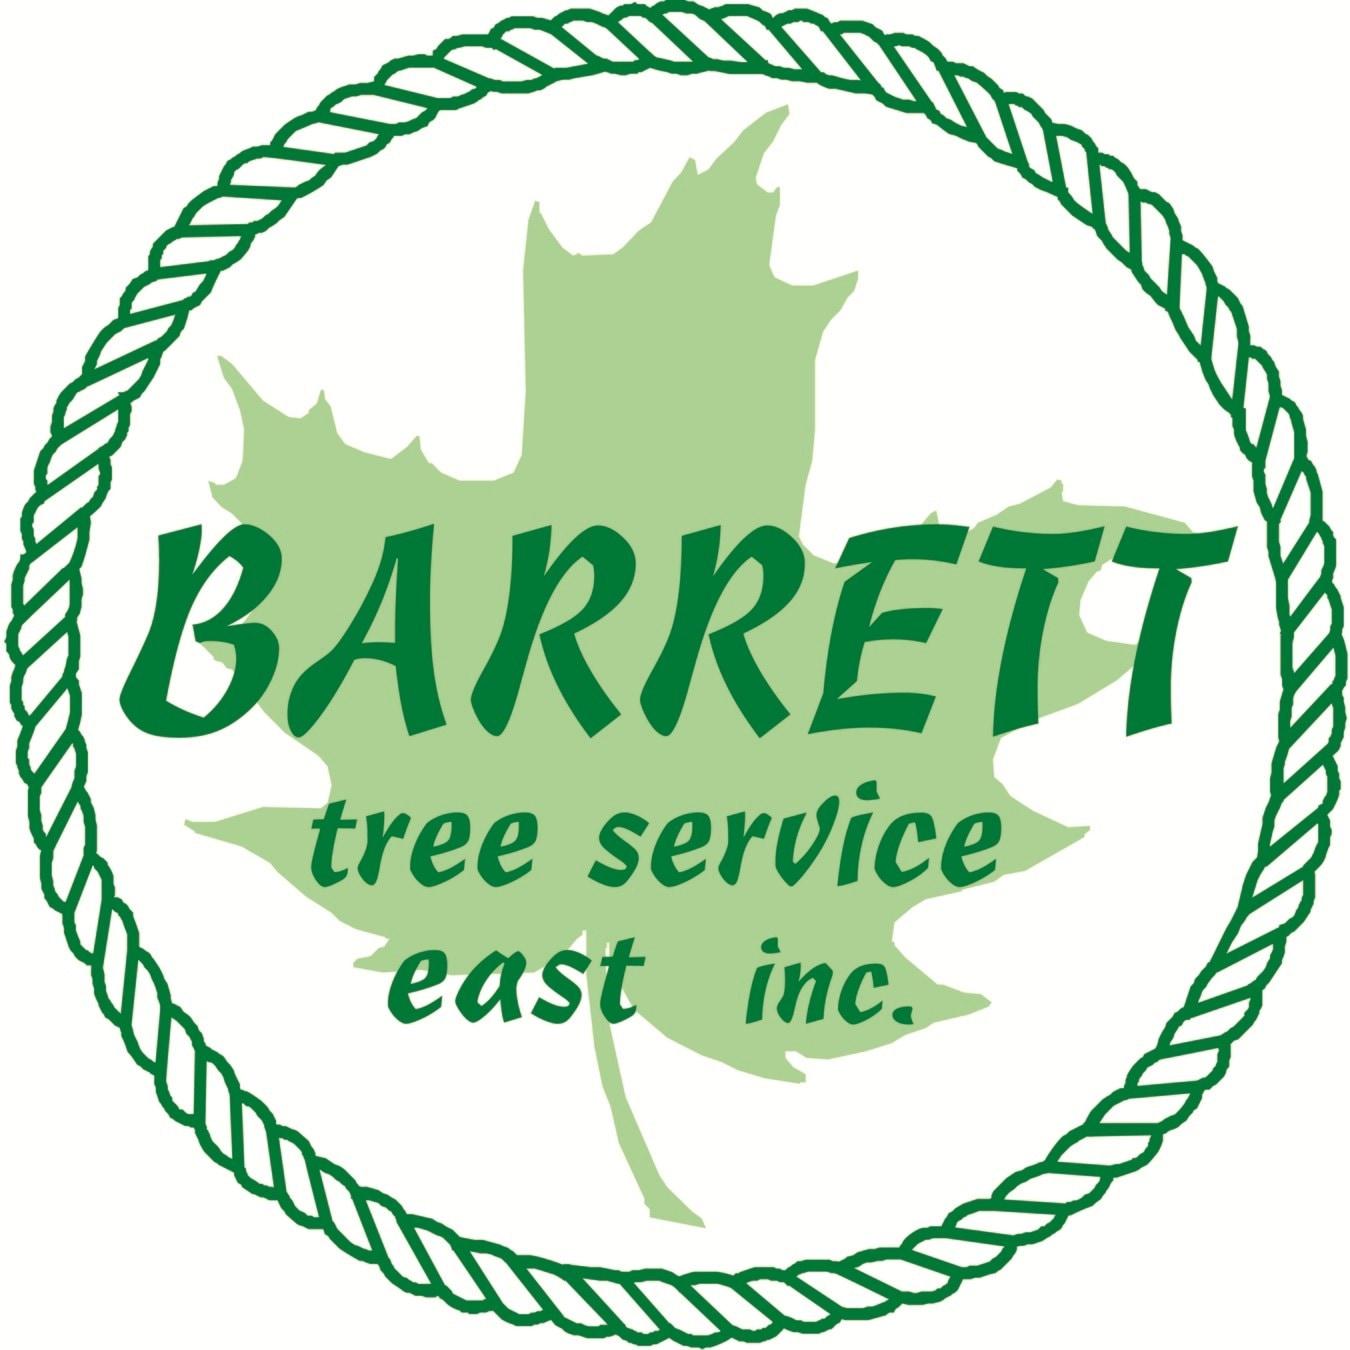 Barrett Tree Service East, Inc. logo